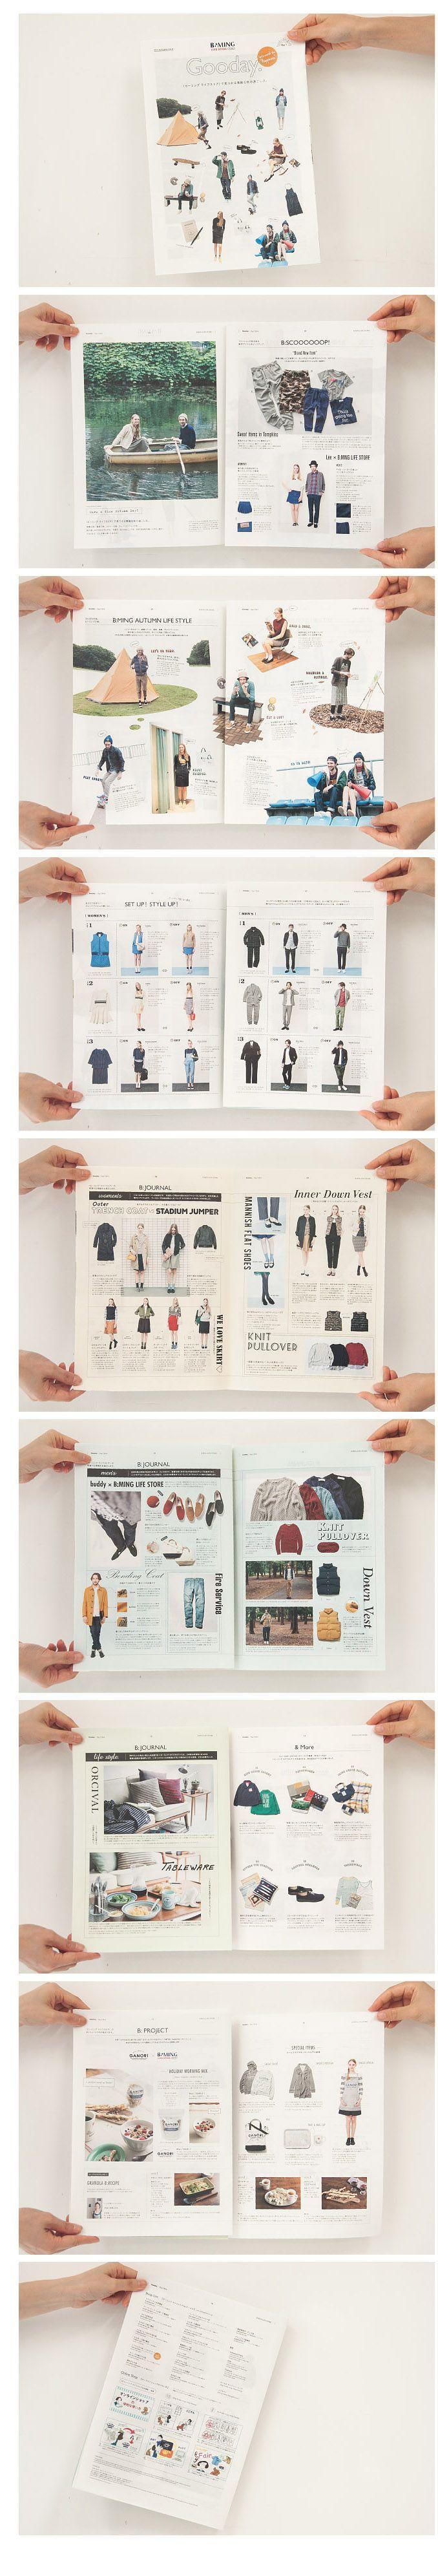 B:Ming Life Store: